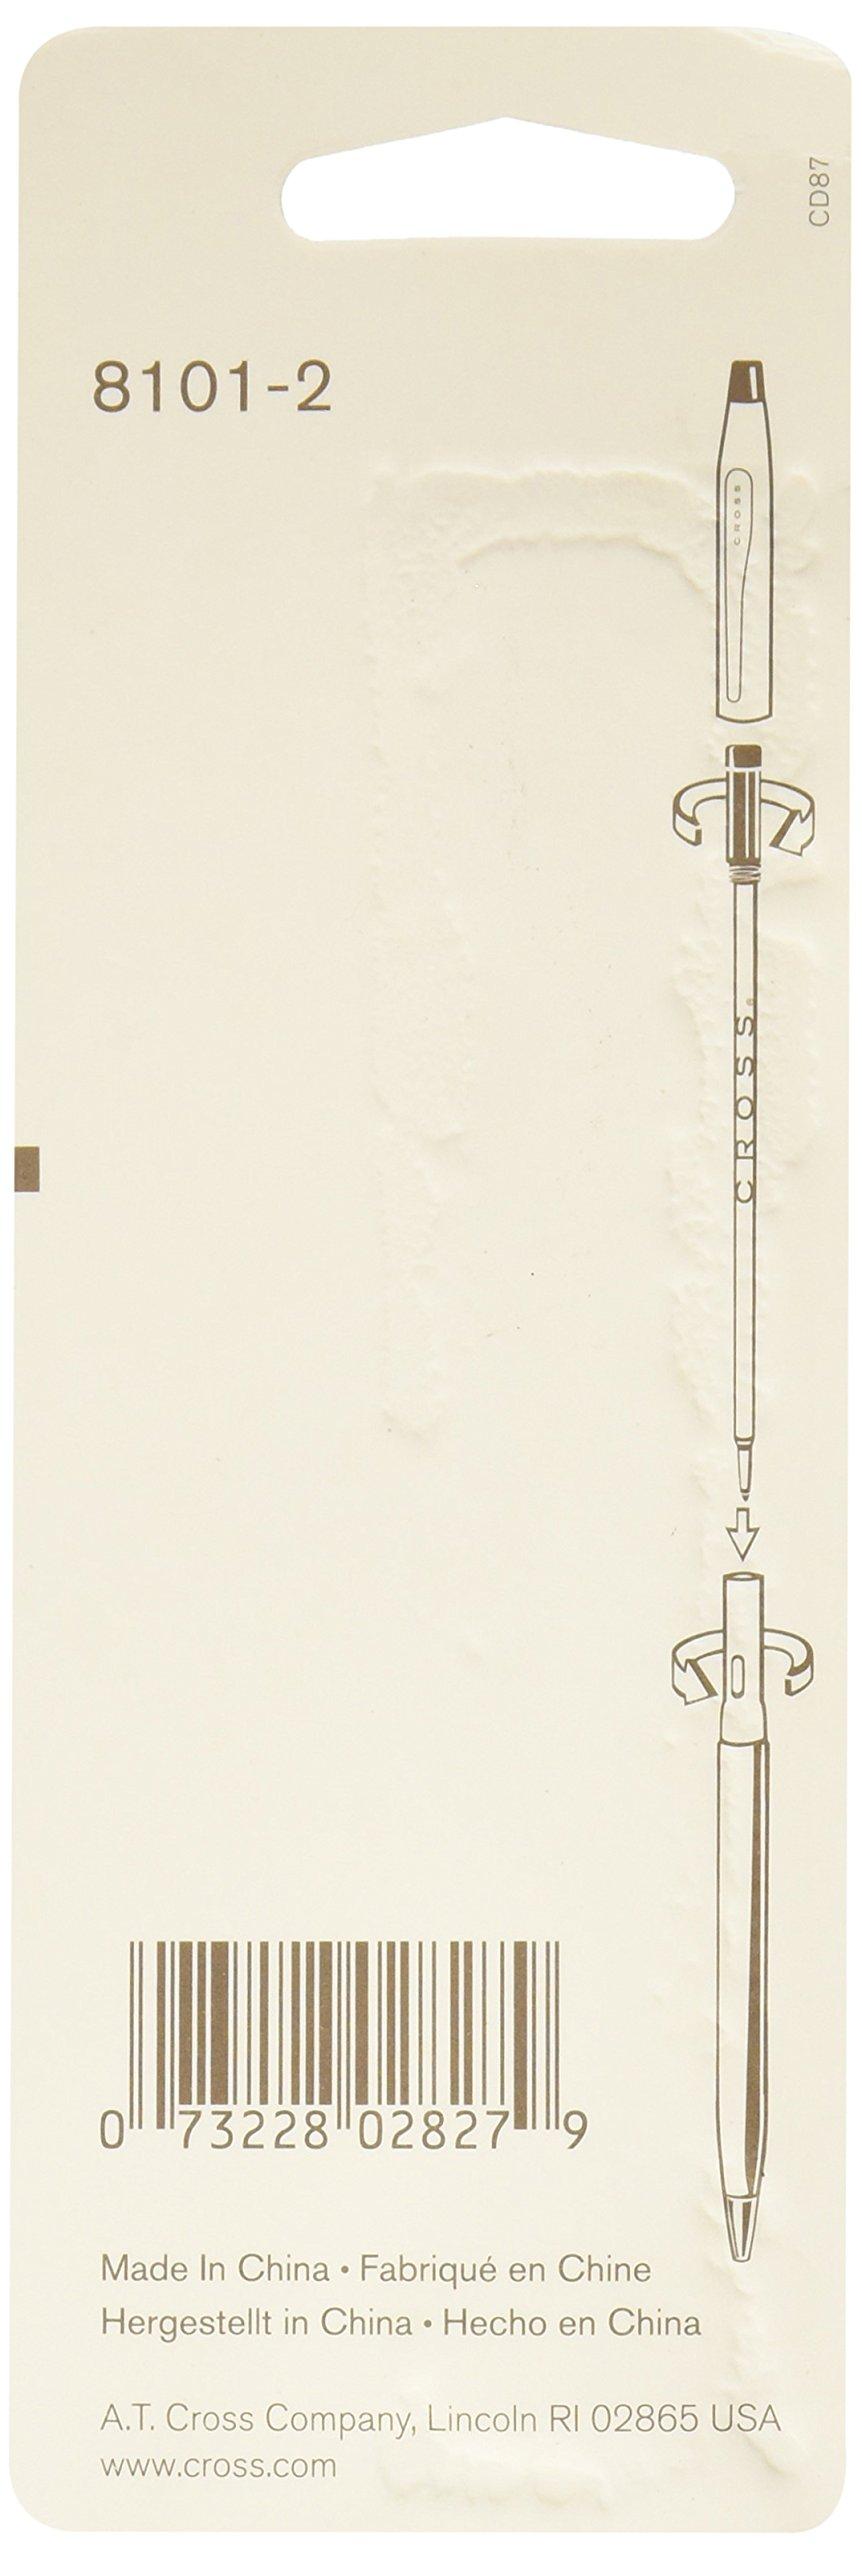 Cross Ballpoint Pen Refill 12-Pack Black Broad by Cross (Image #2)